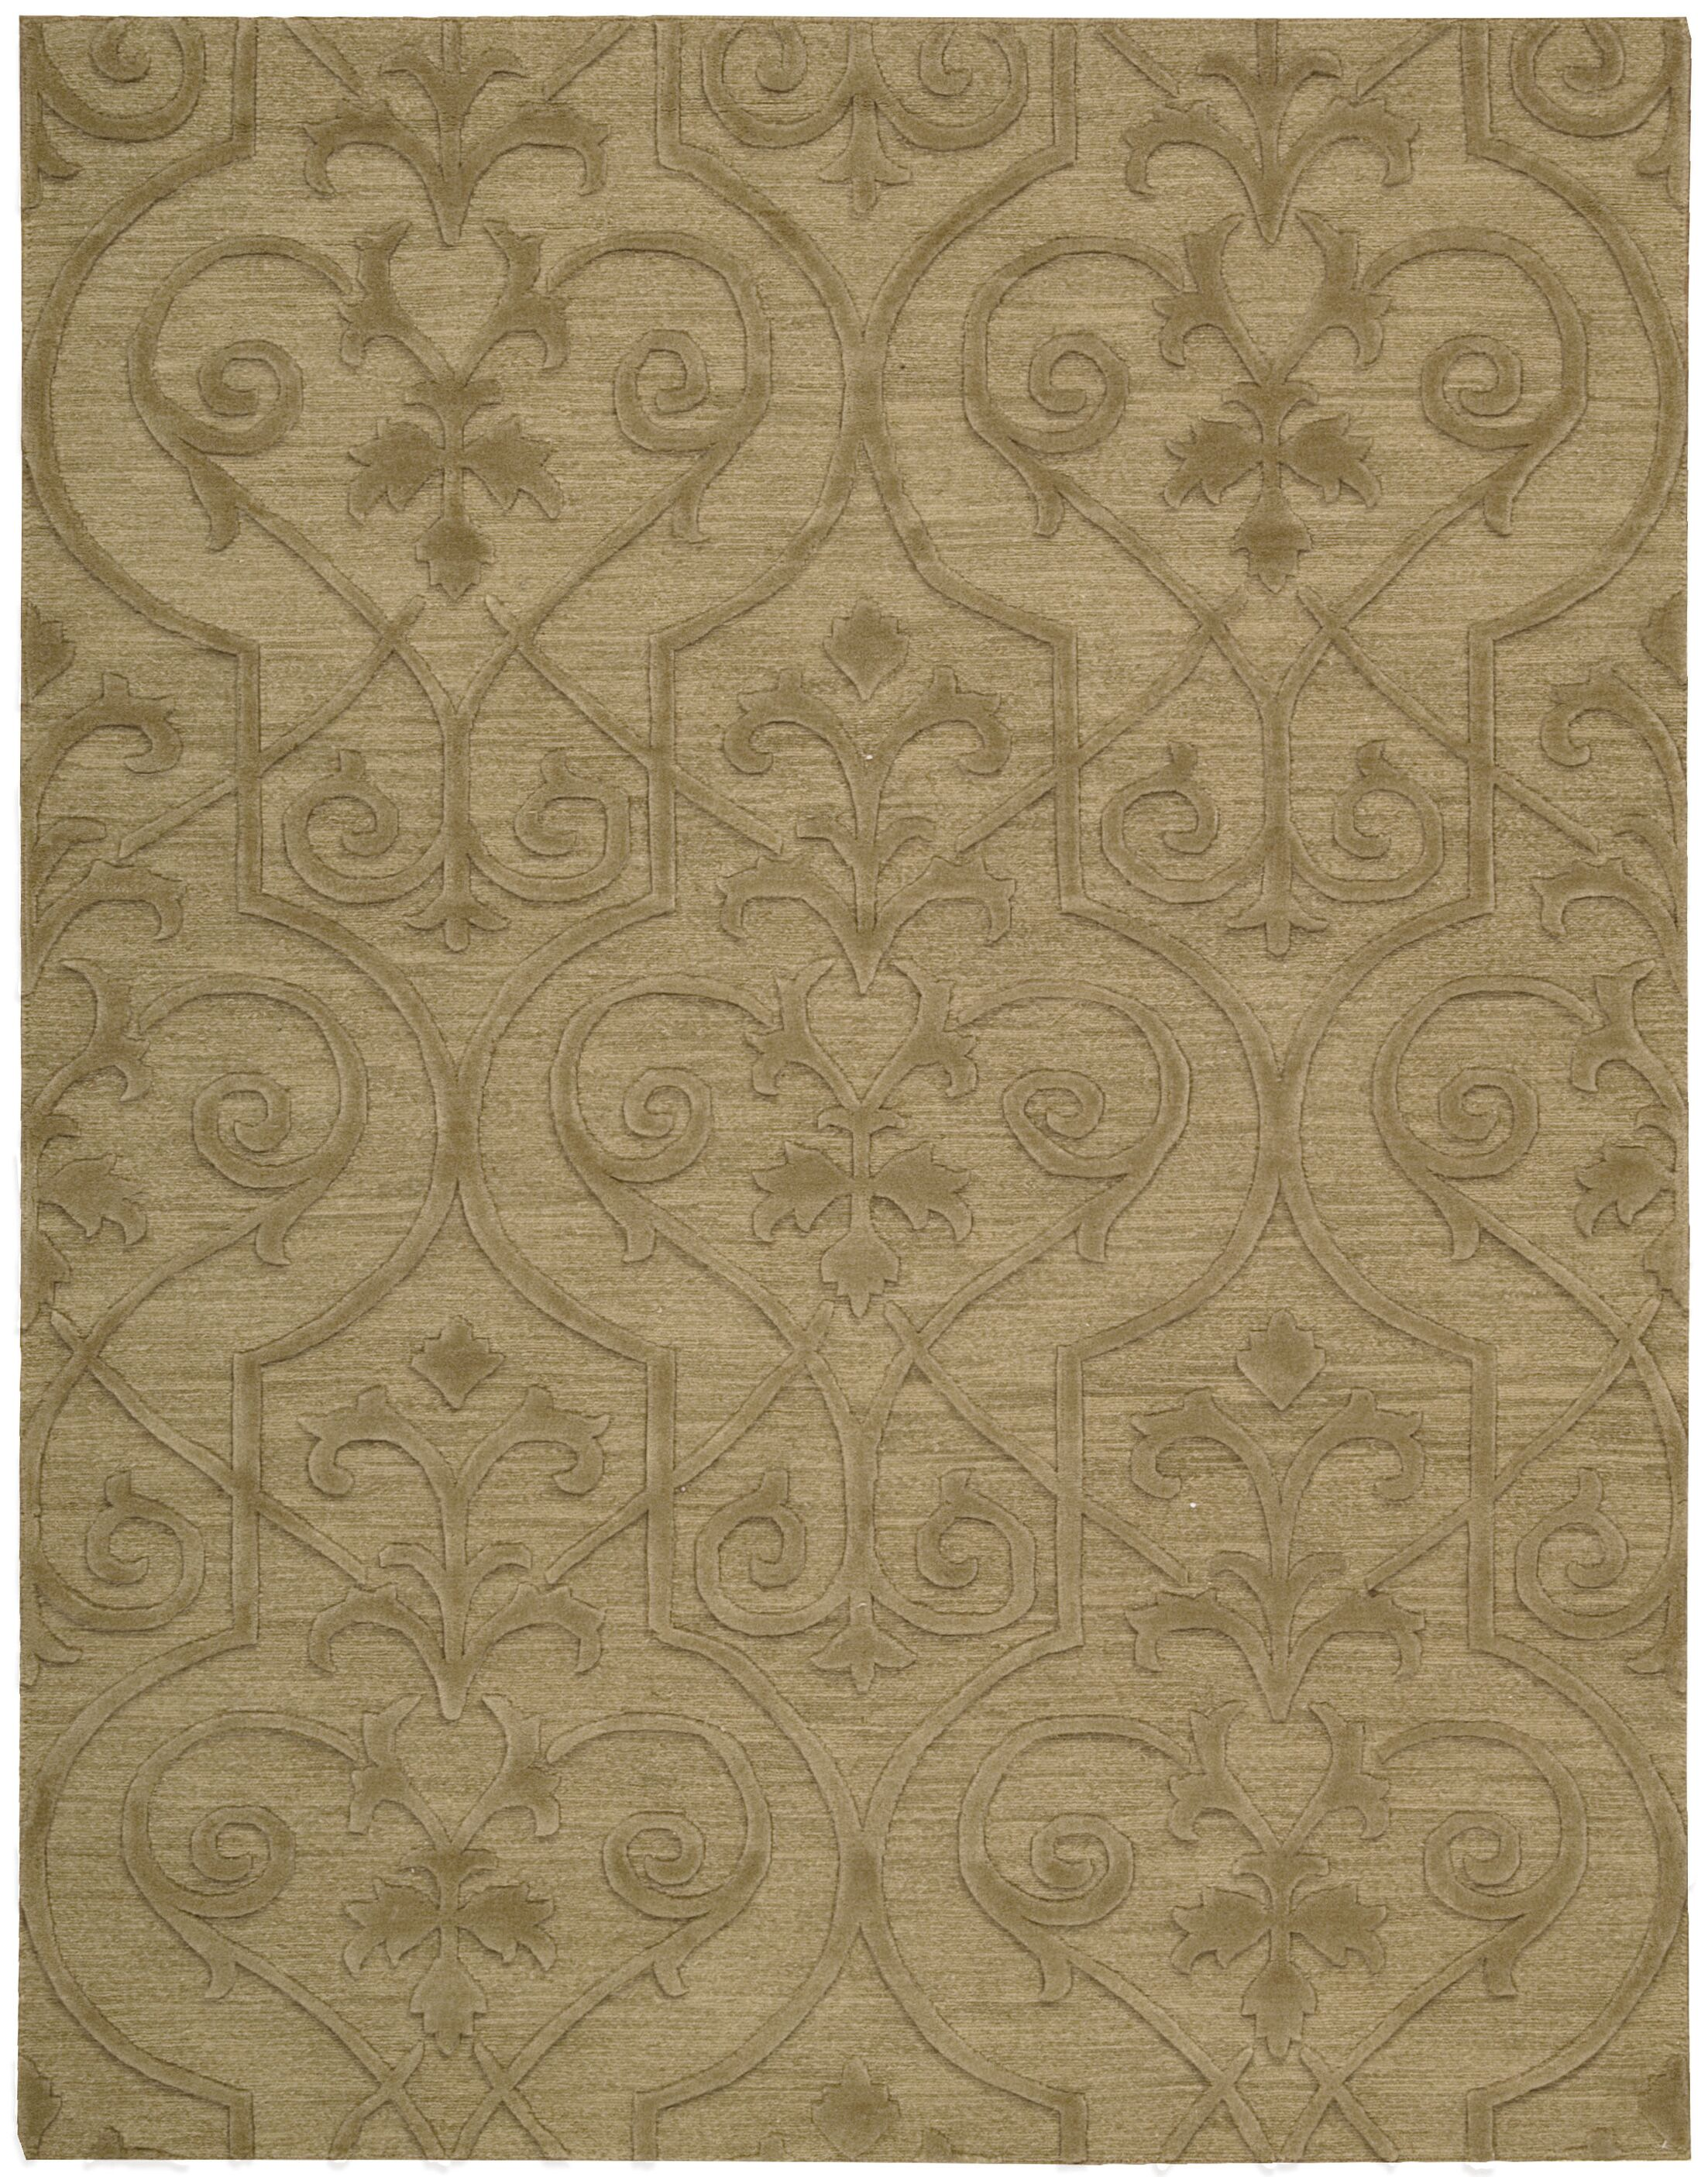 Cedarwood Hand-Woven Khaki Area Rug Rug Size: Rectangle 5'6